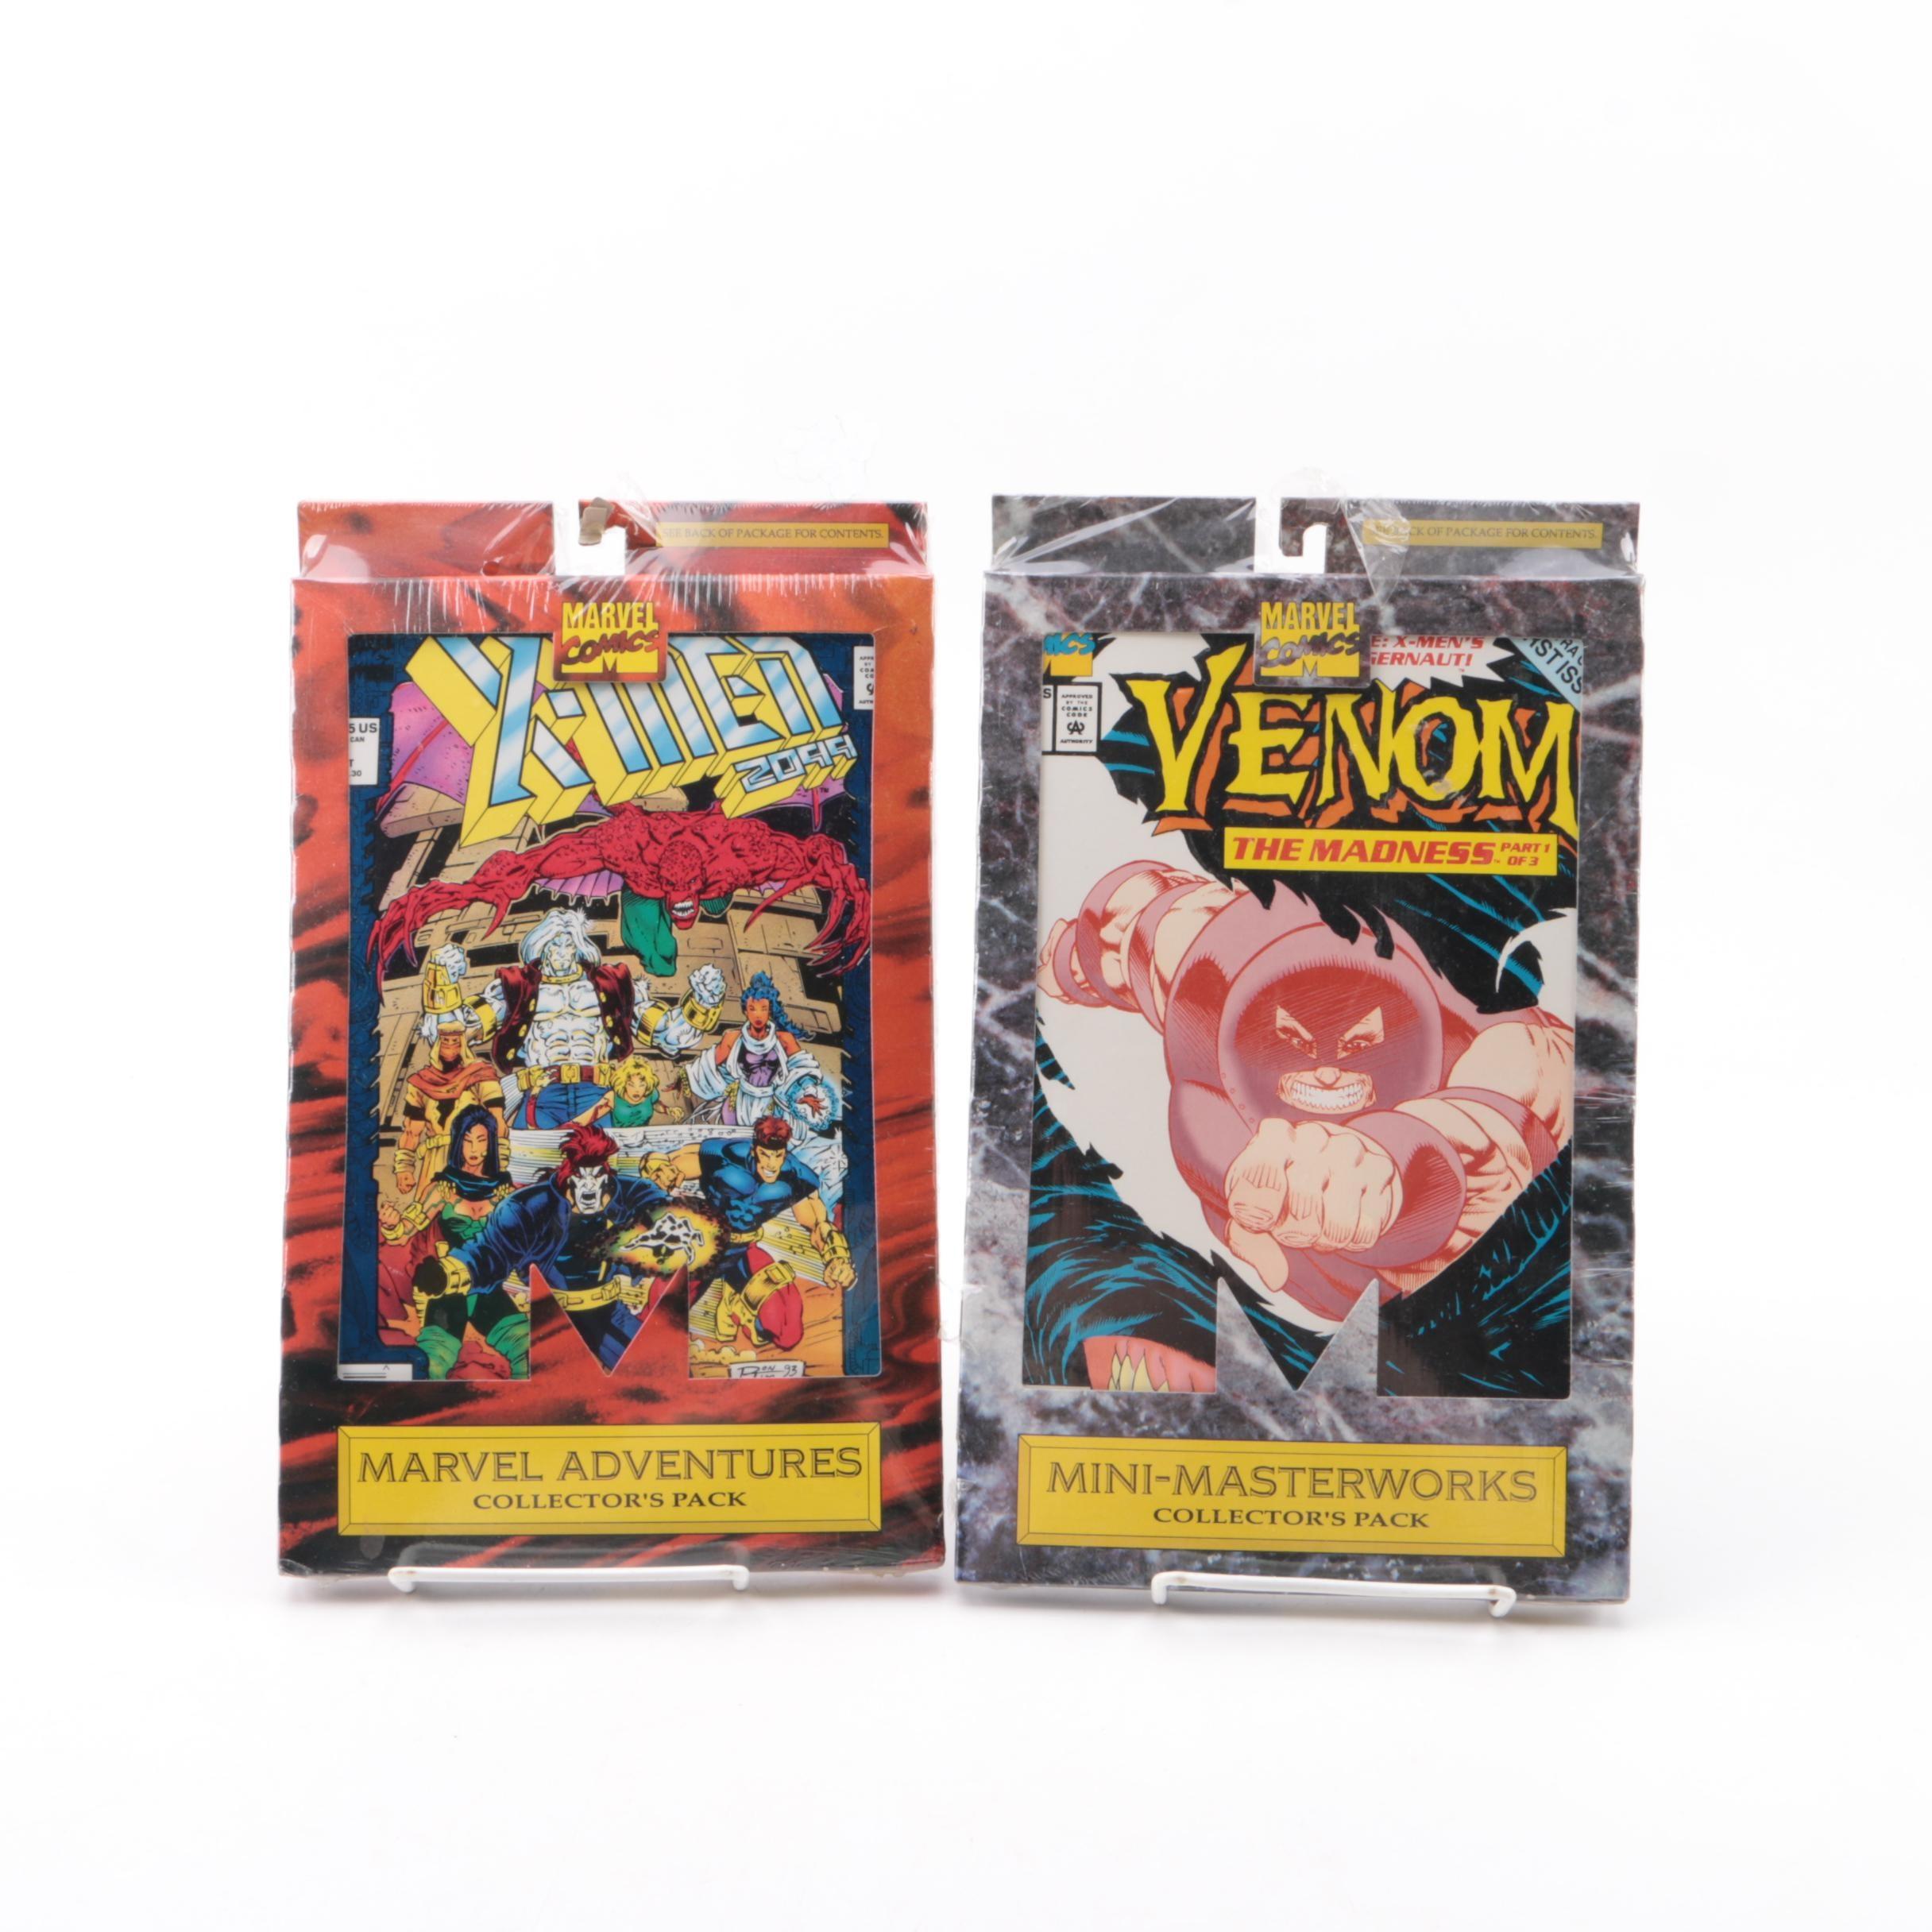 "Marvel Collector's Packs Including X-Men 2099"" and ""Venom"""